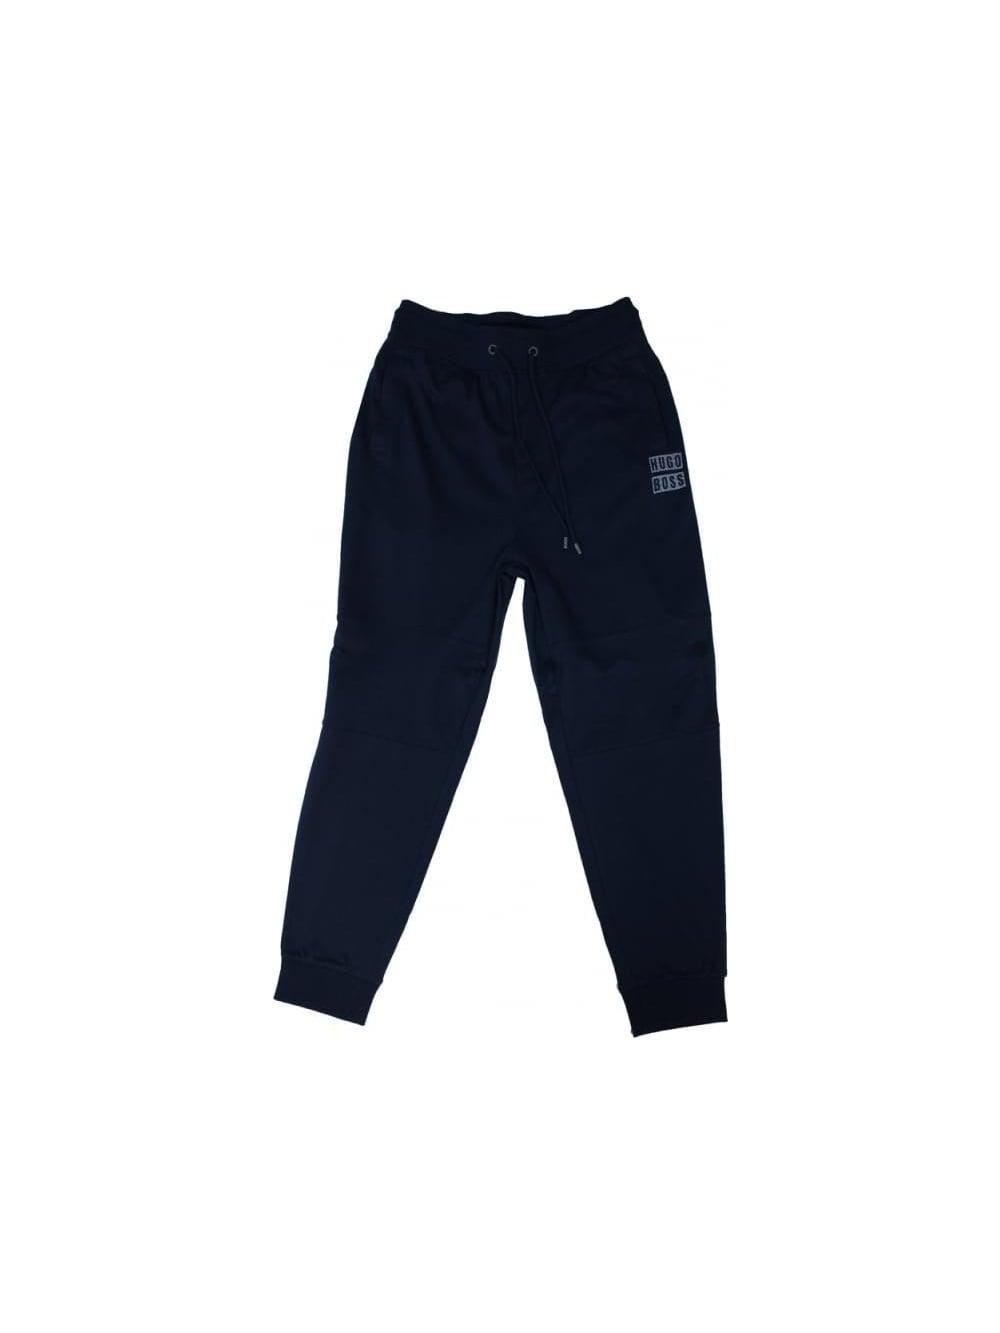 13d2e34f8 Hugo Boss Black Logo Cuffed Sweat Pants in Dark Blue - Northern Threads